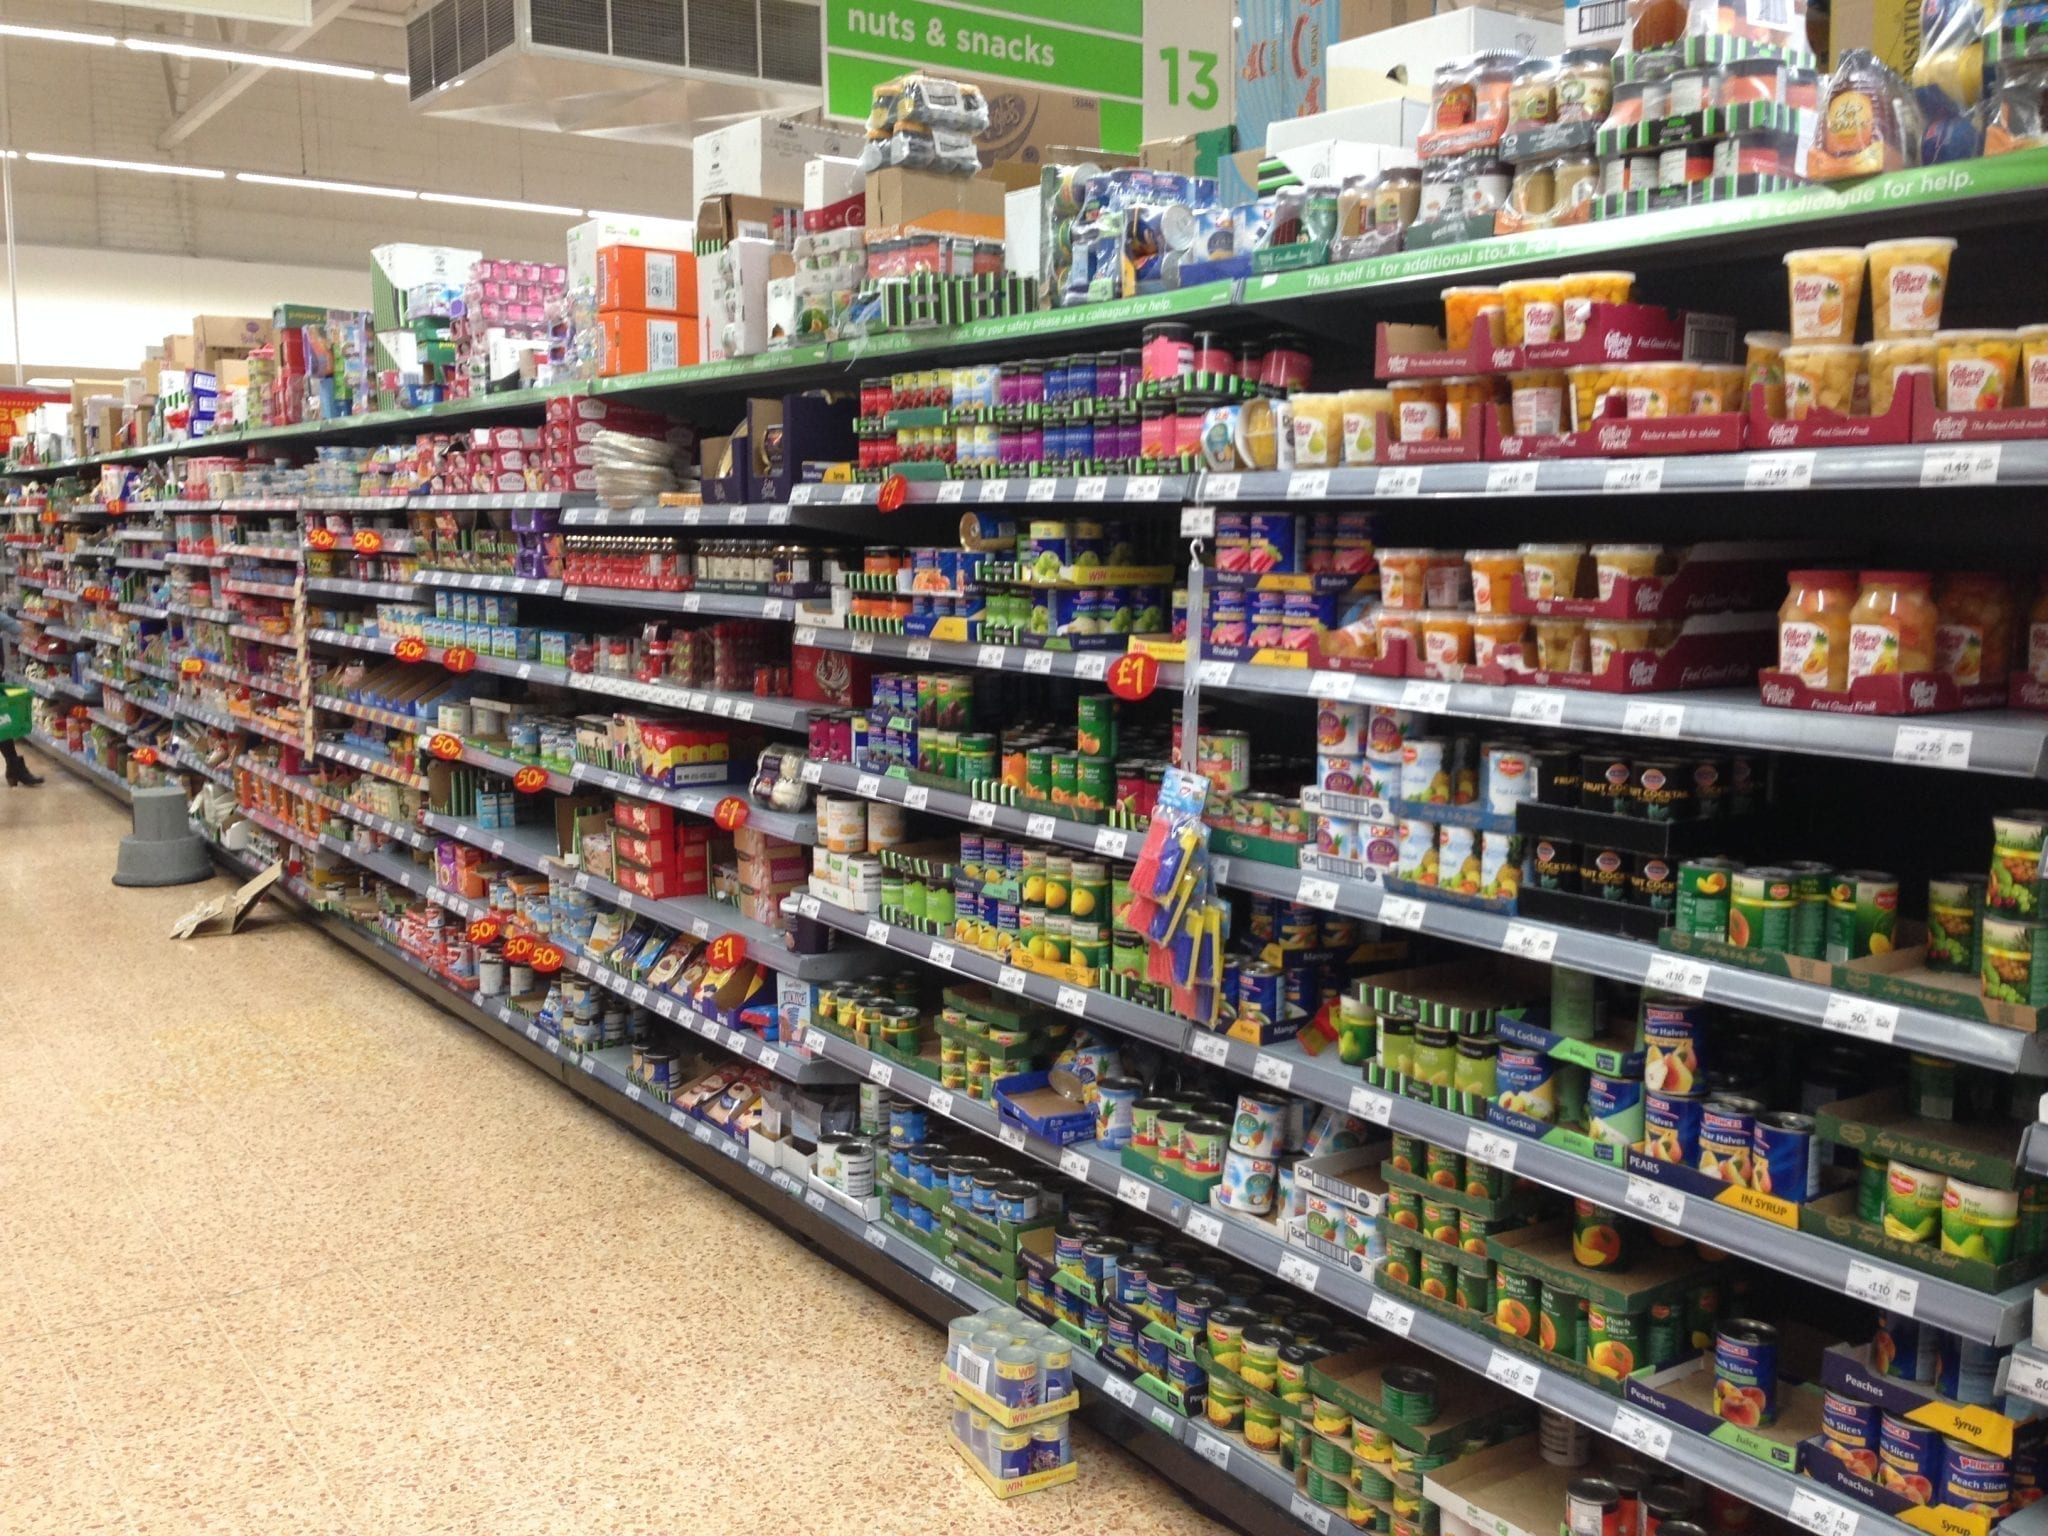 Tins on Supermarket shelf - Making Business Matter